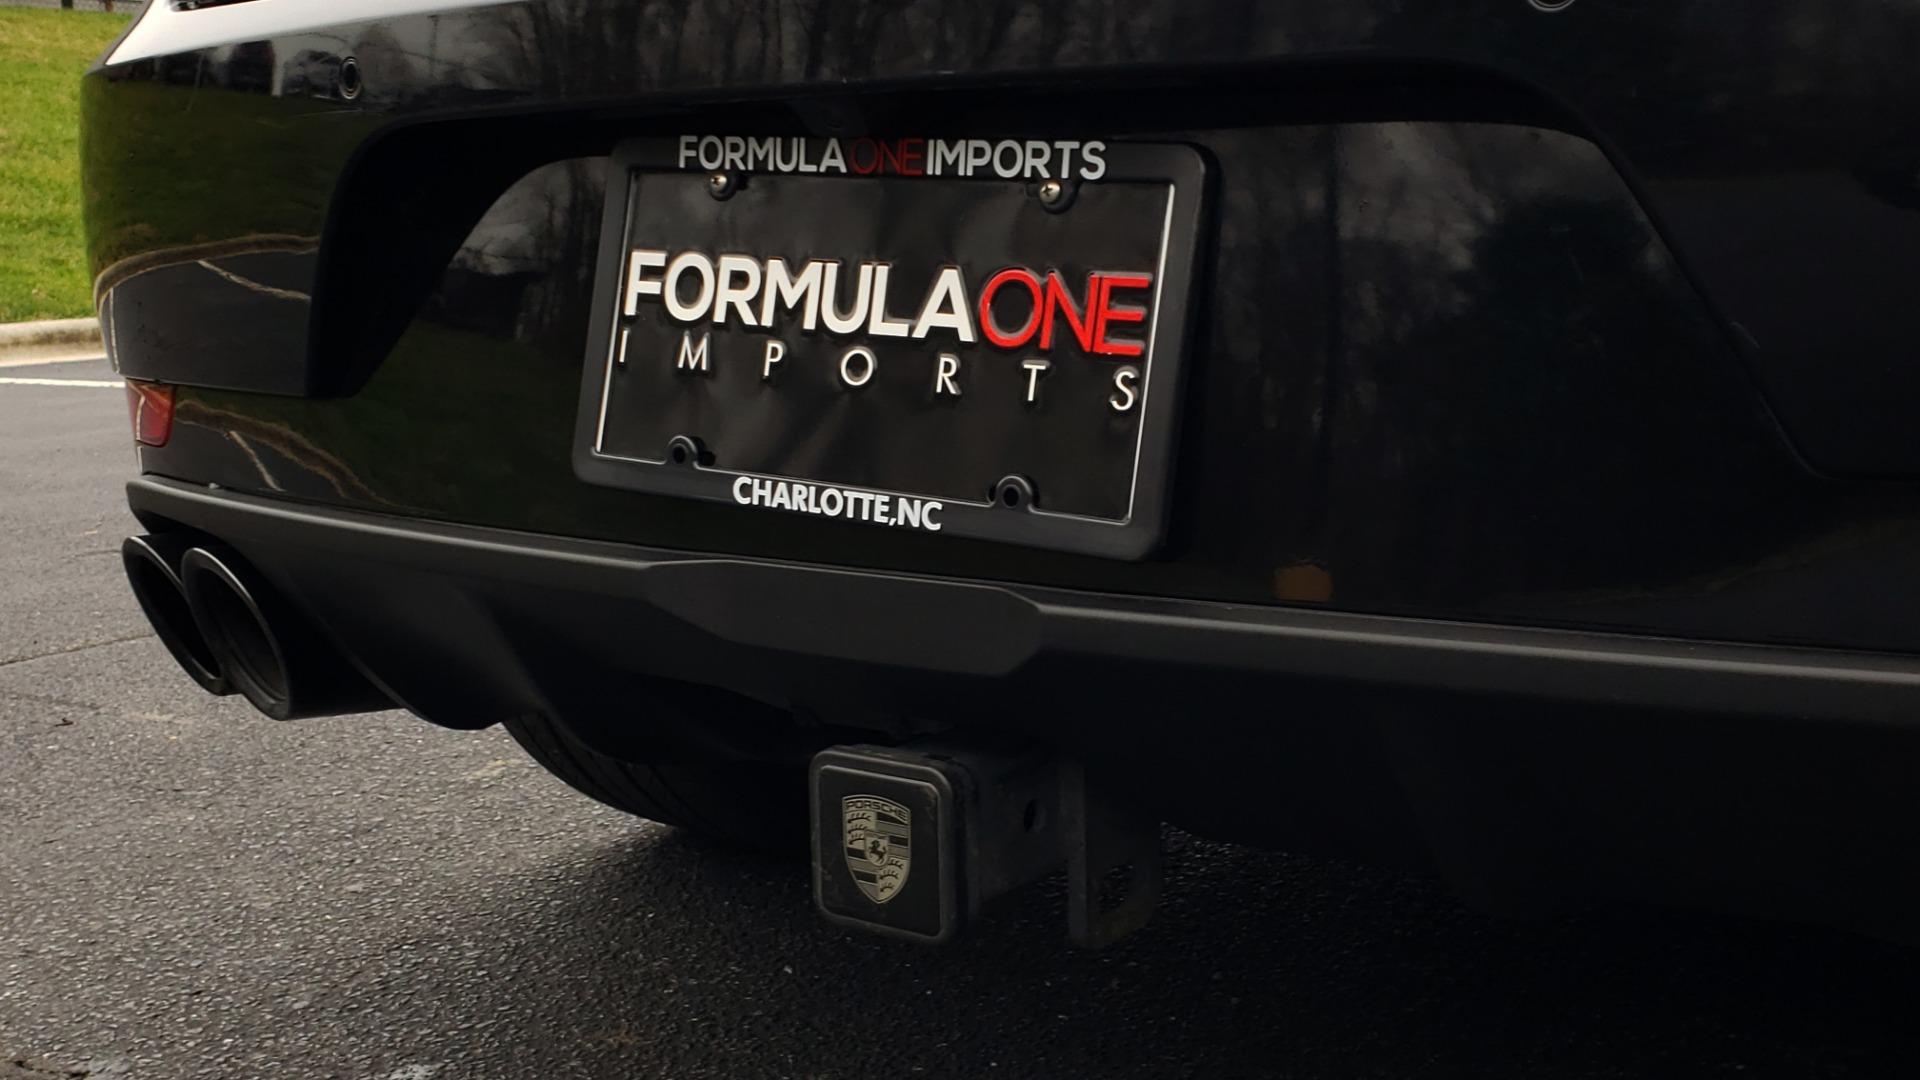 Used 2016 Porsche MACAN TURBO / PREM / NAV / PARK ASST / BOSE / PDK / CHRONO PKG for sale Sold at Formula Imports in Charlotte NC 28227 28